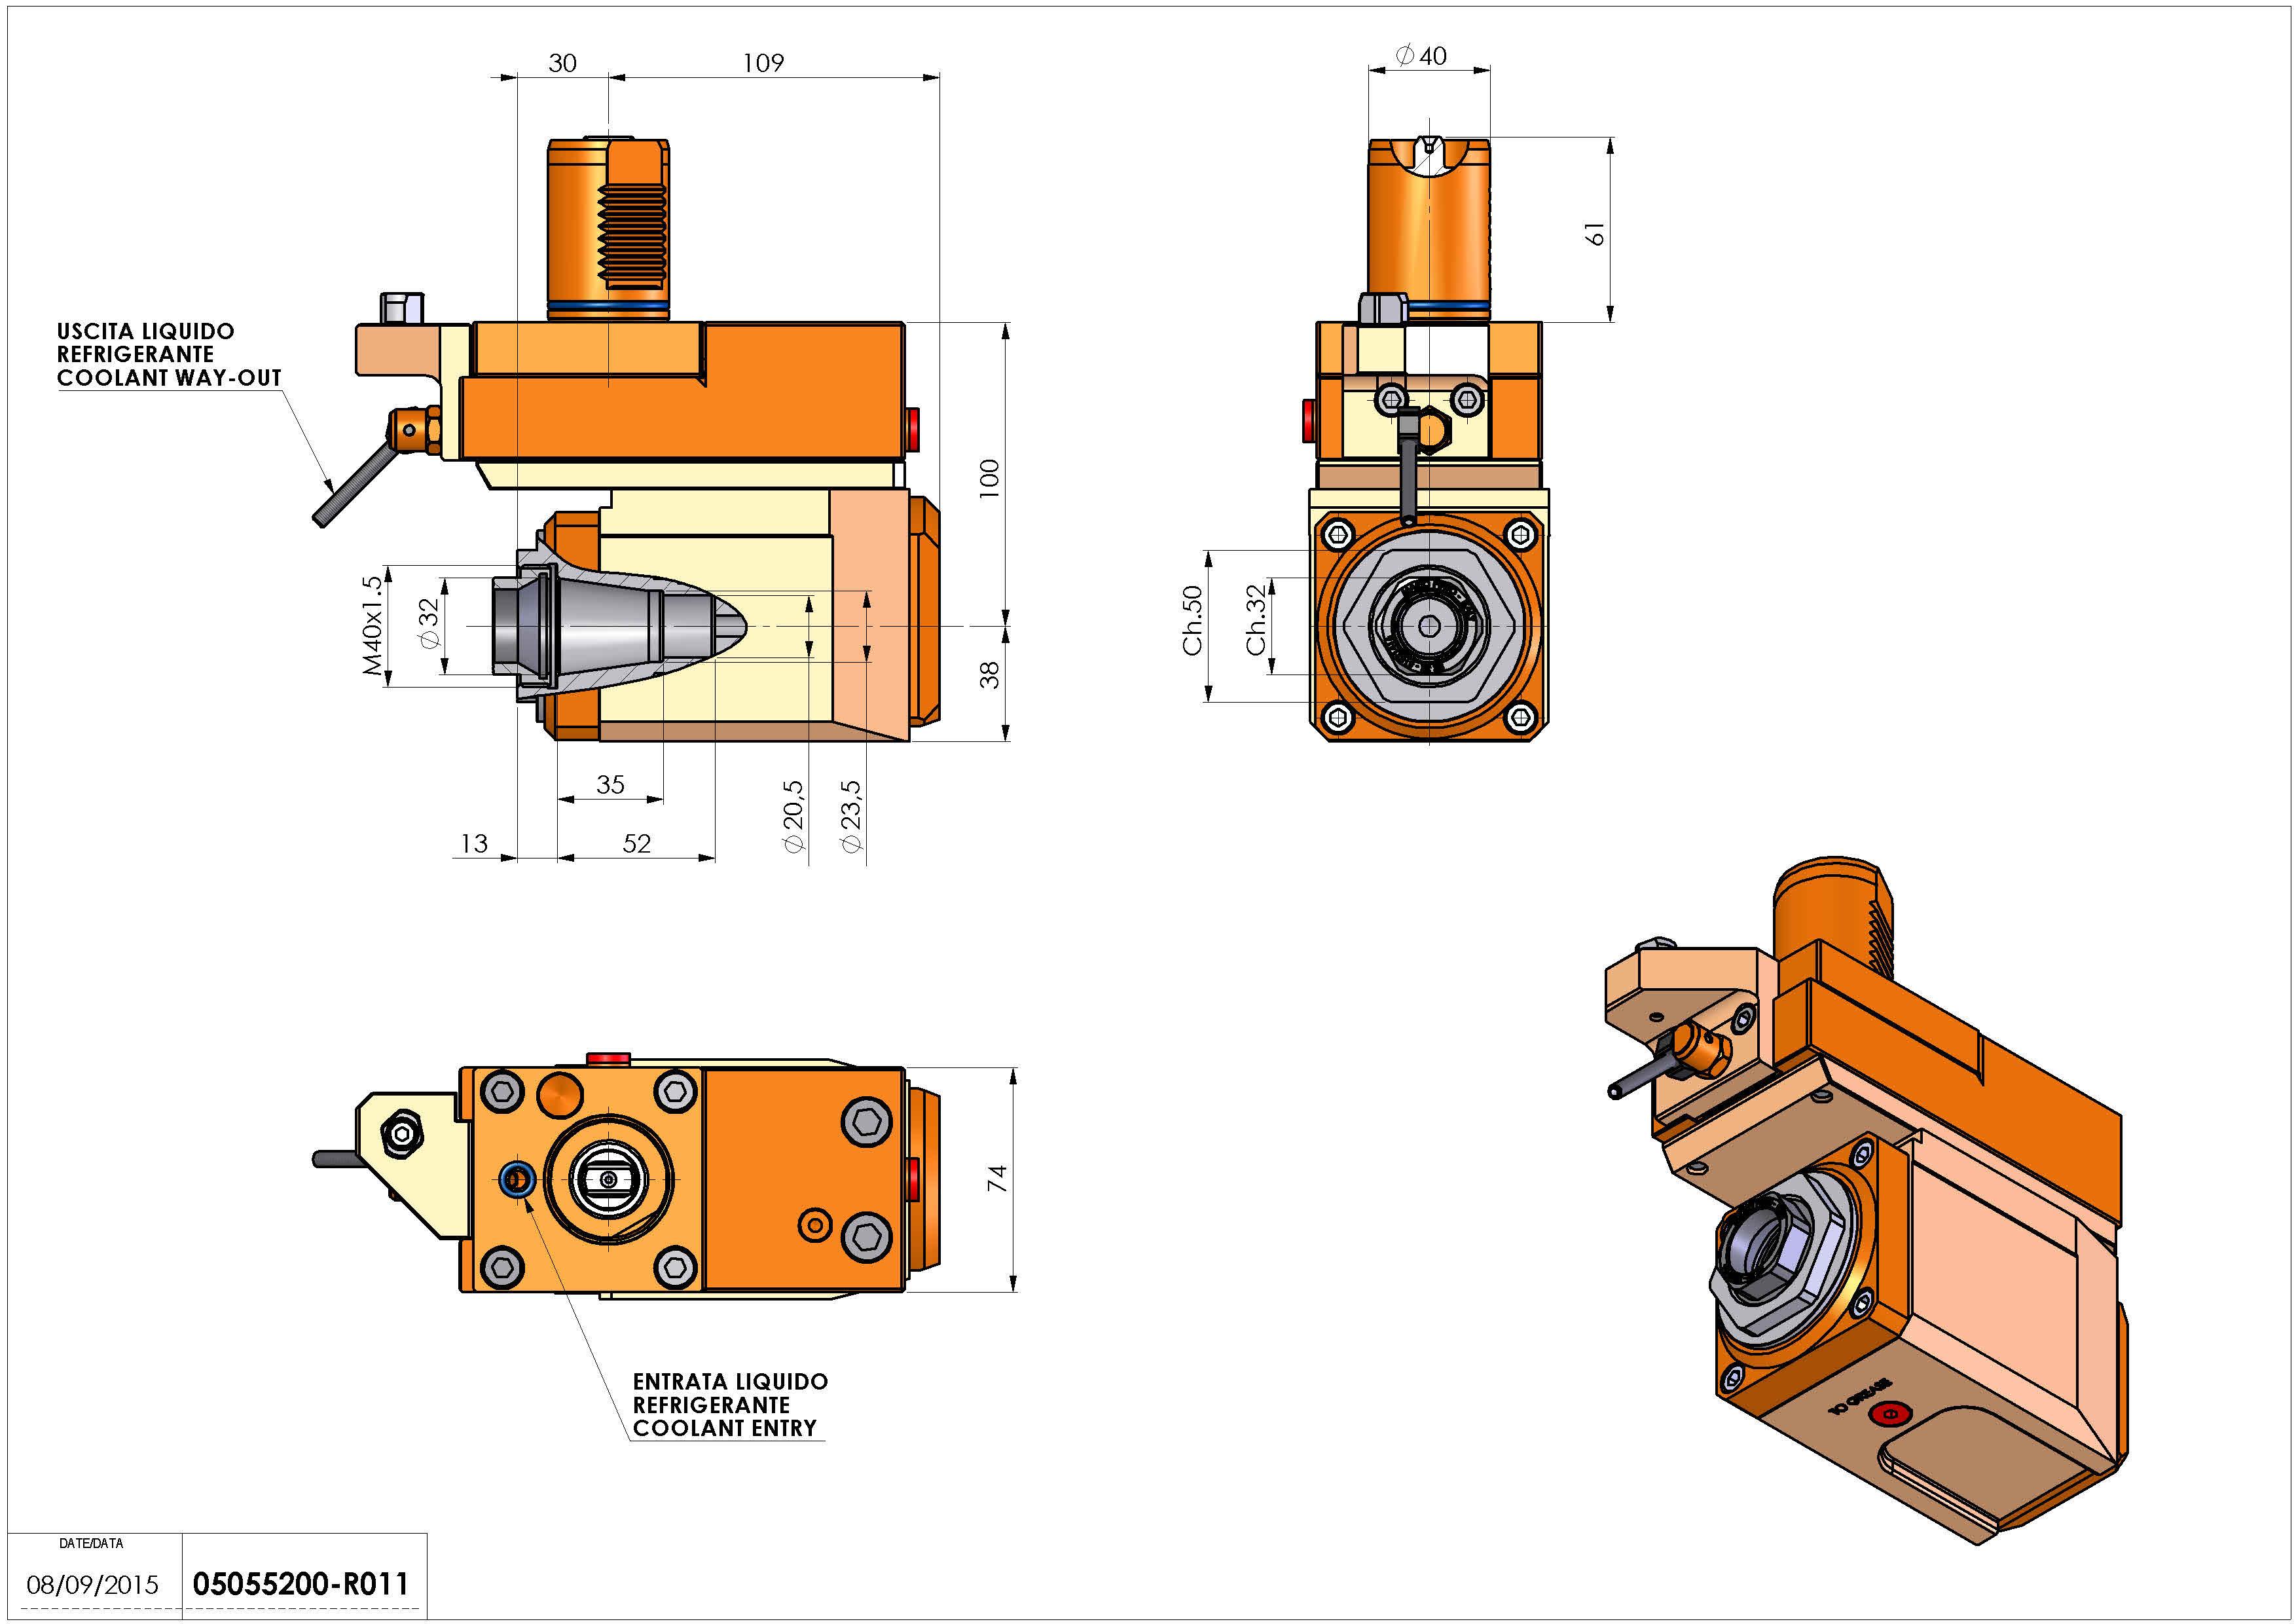 Technical image - LT-A VDI40 ER32F R OFS H100 MZ.